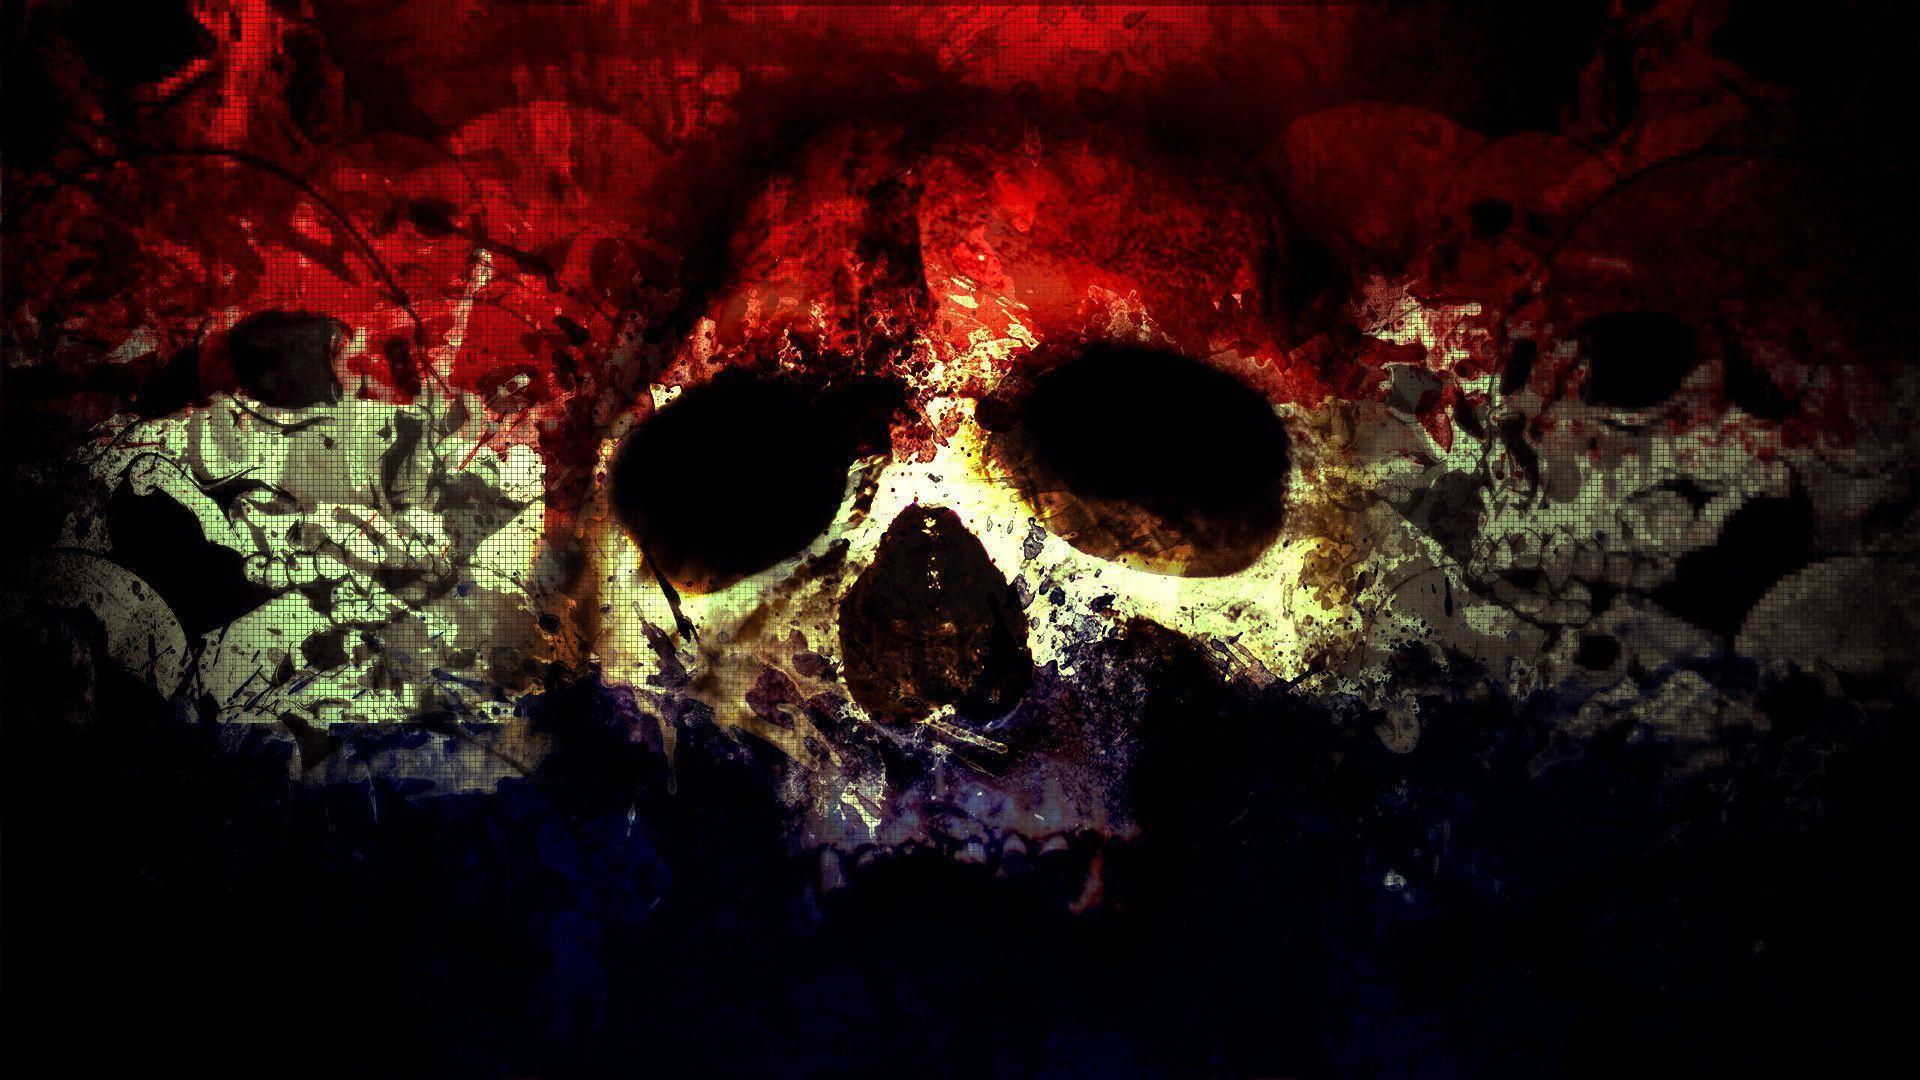 wallpapers skull desktop - photo #12